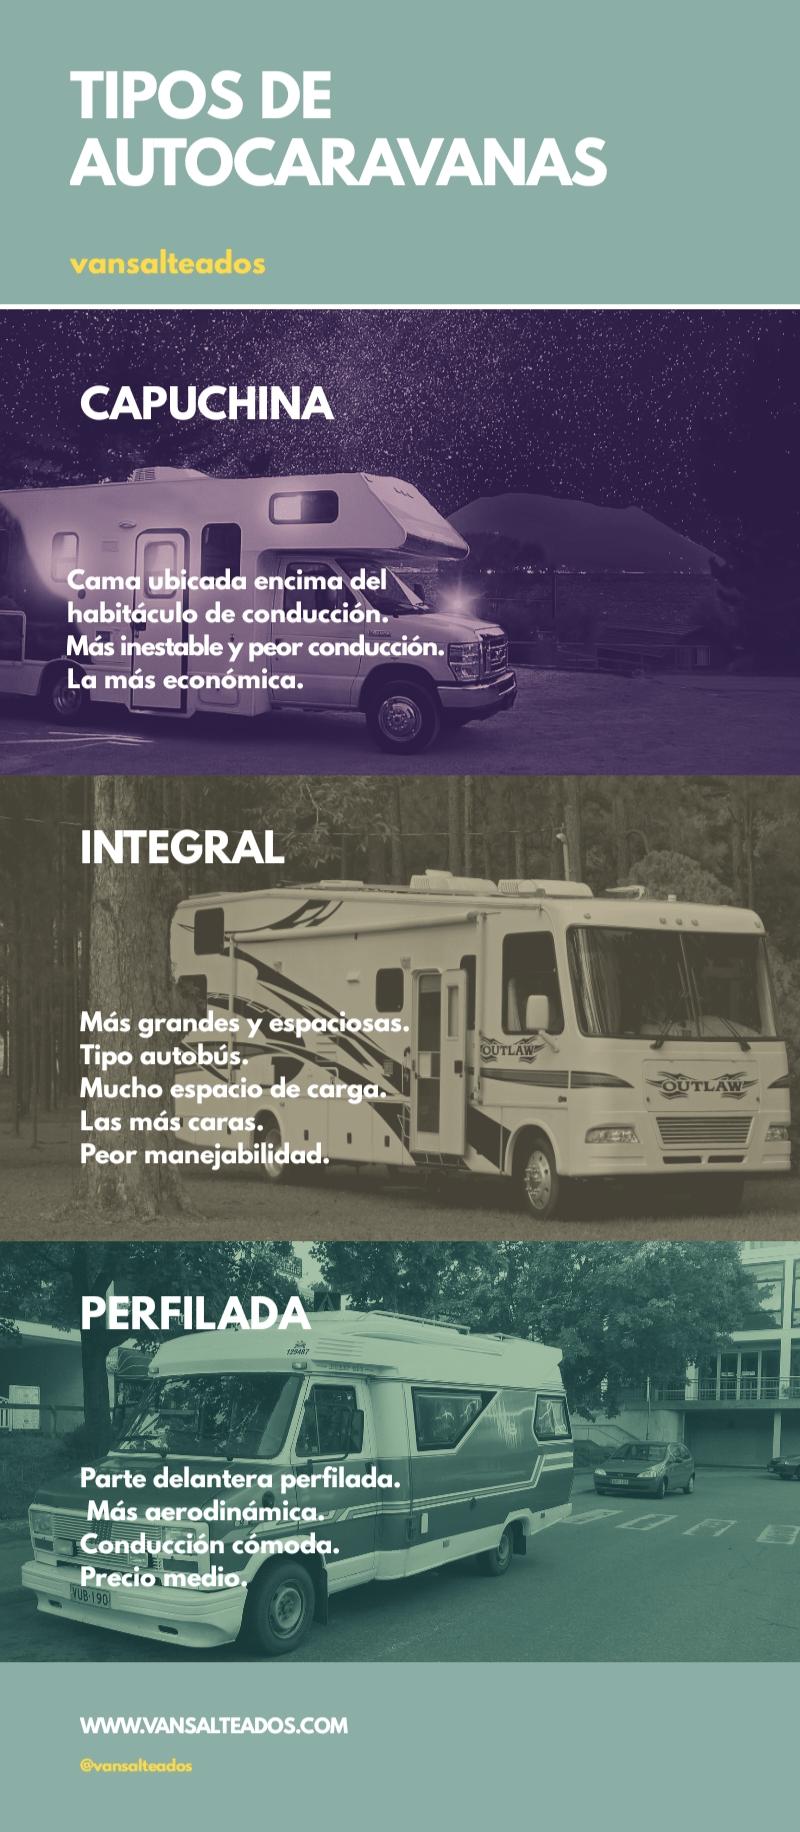 Tipos de autocaravana infografía